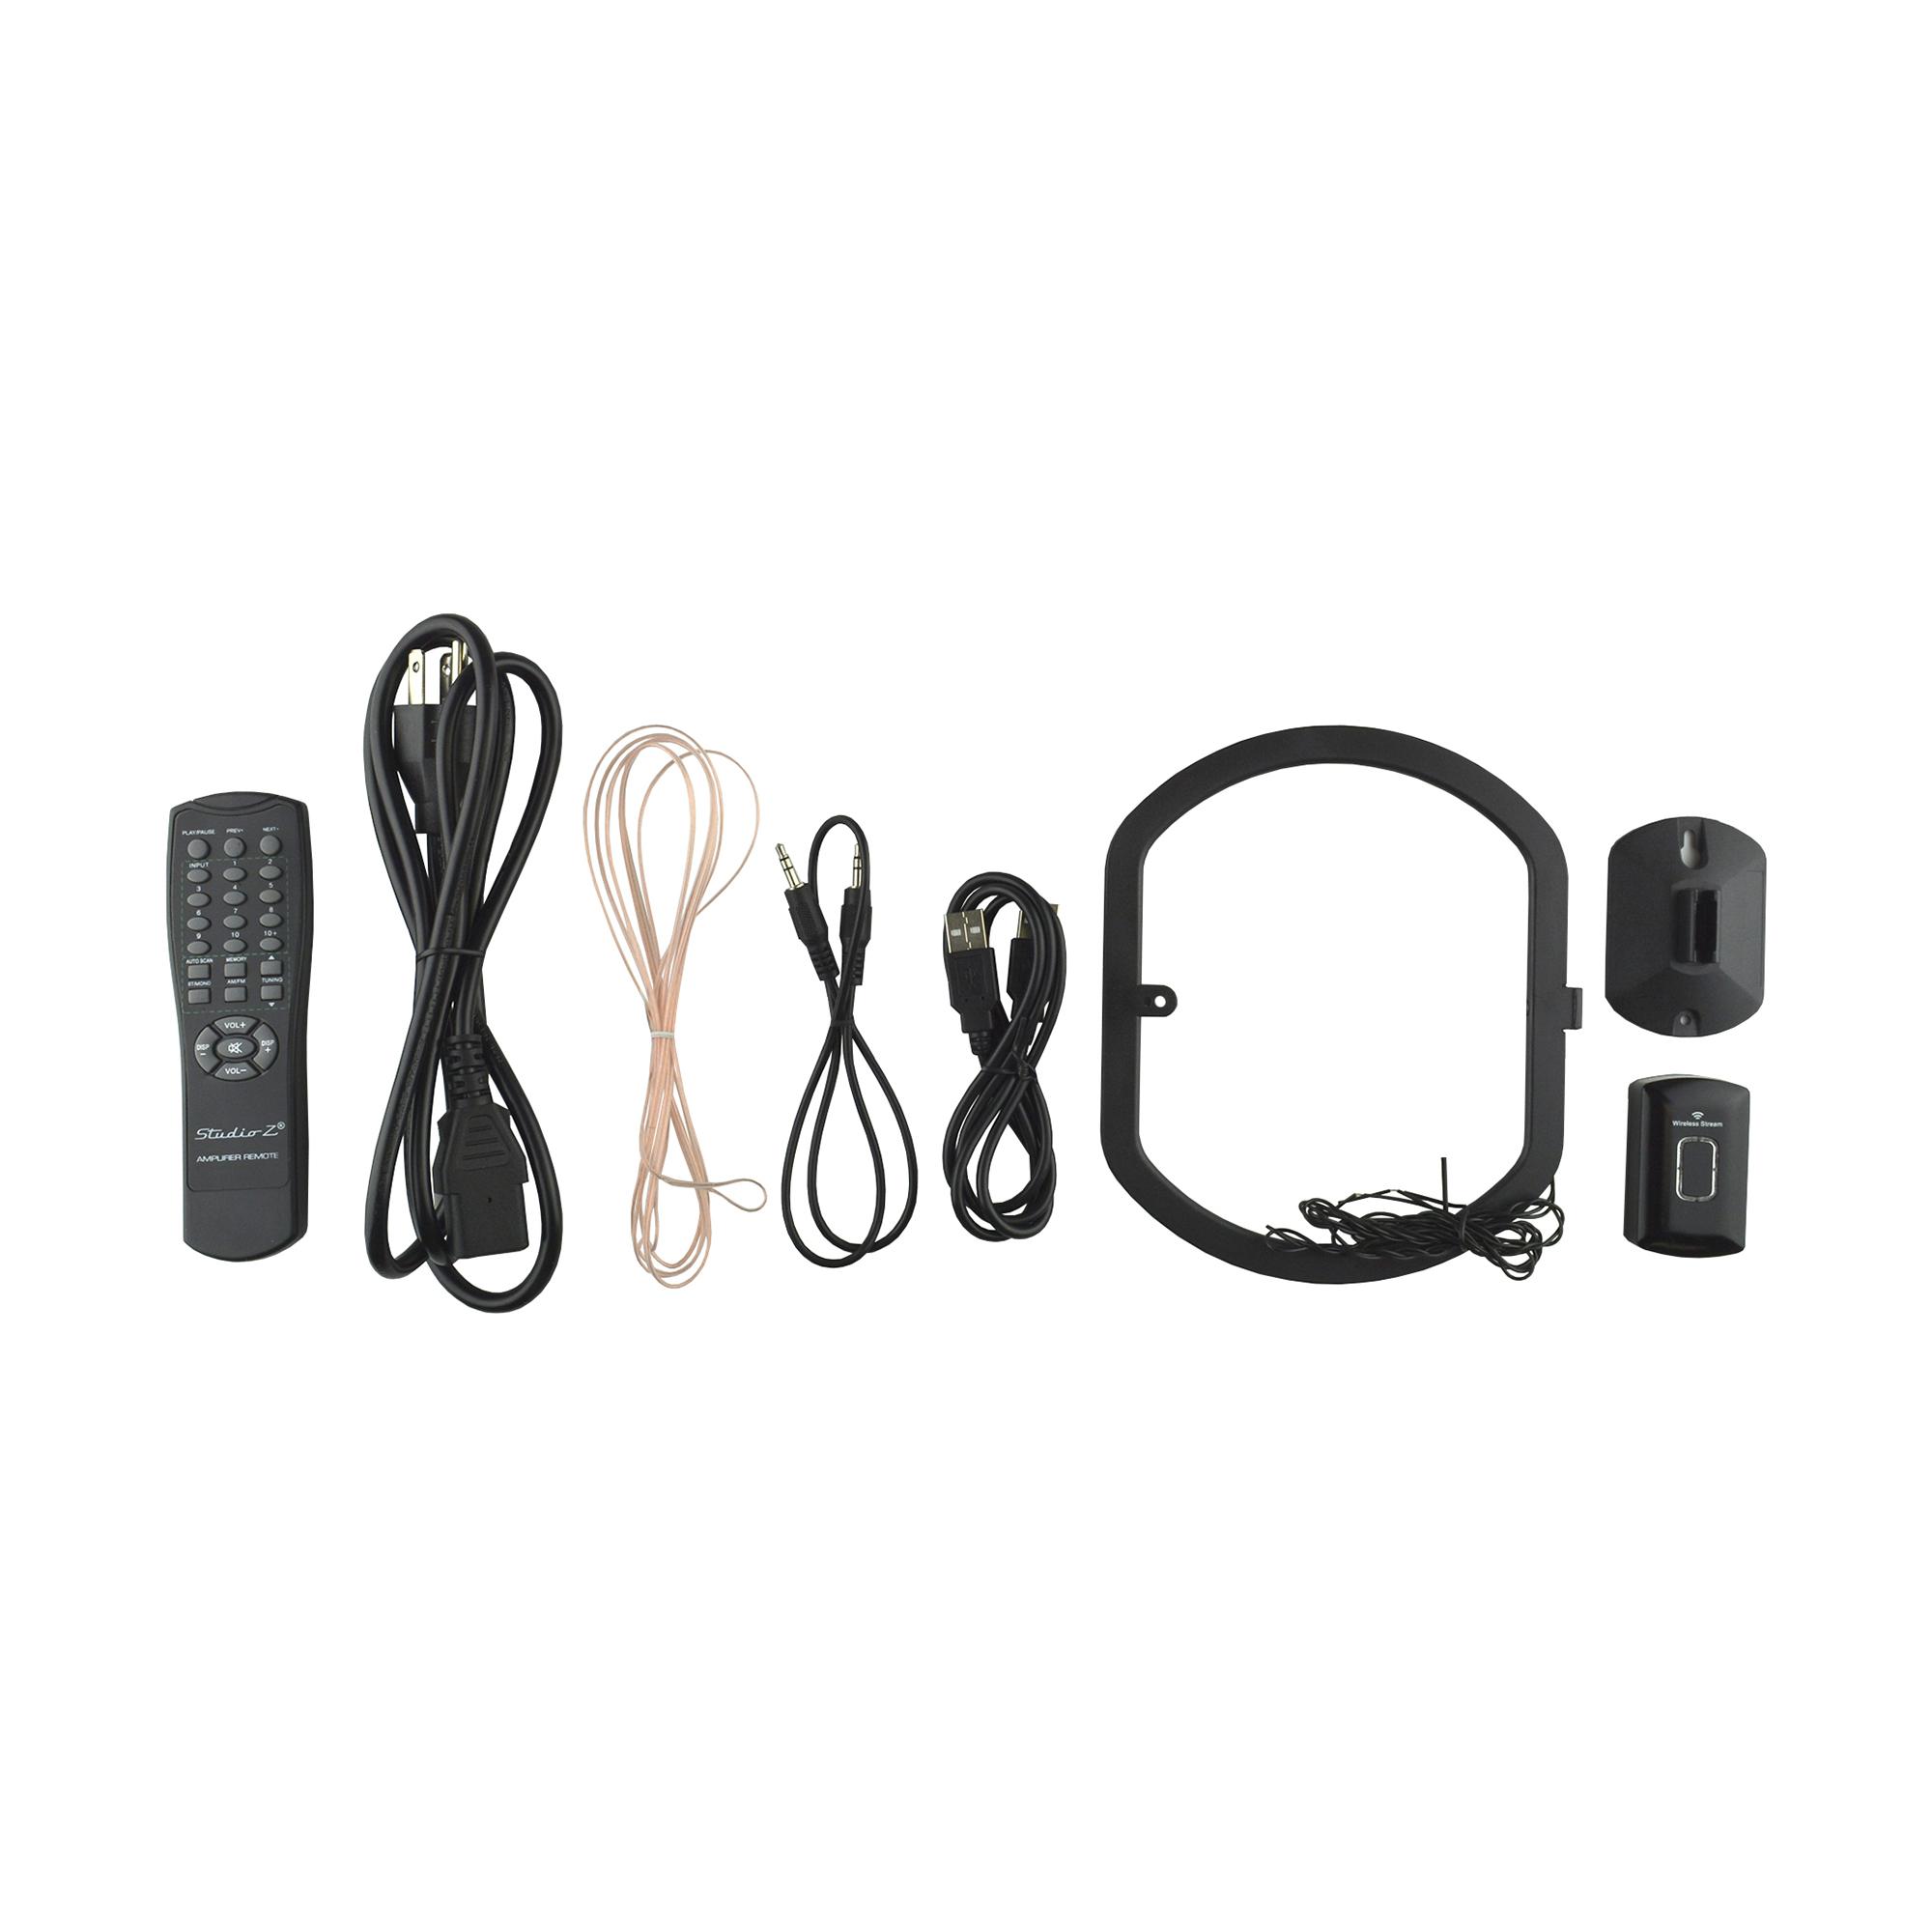 Studio Z SPA-1200BT Digital Home Audio Hybrid Radio